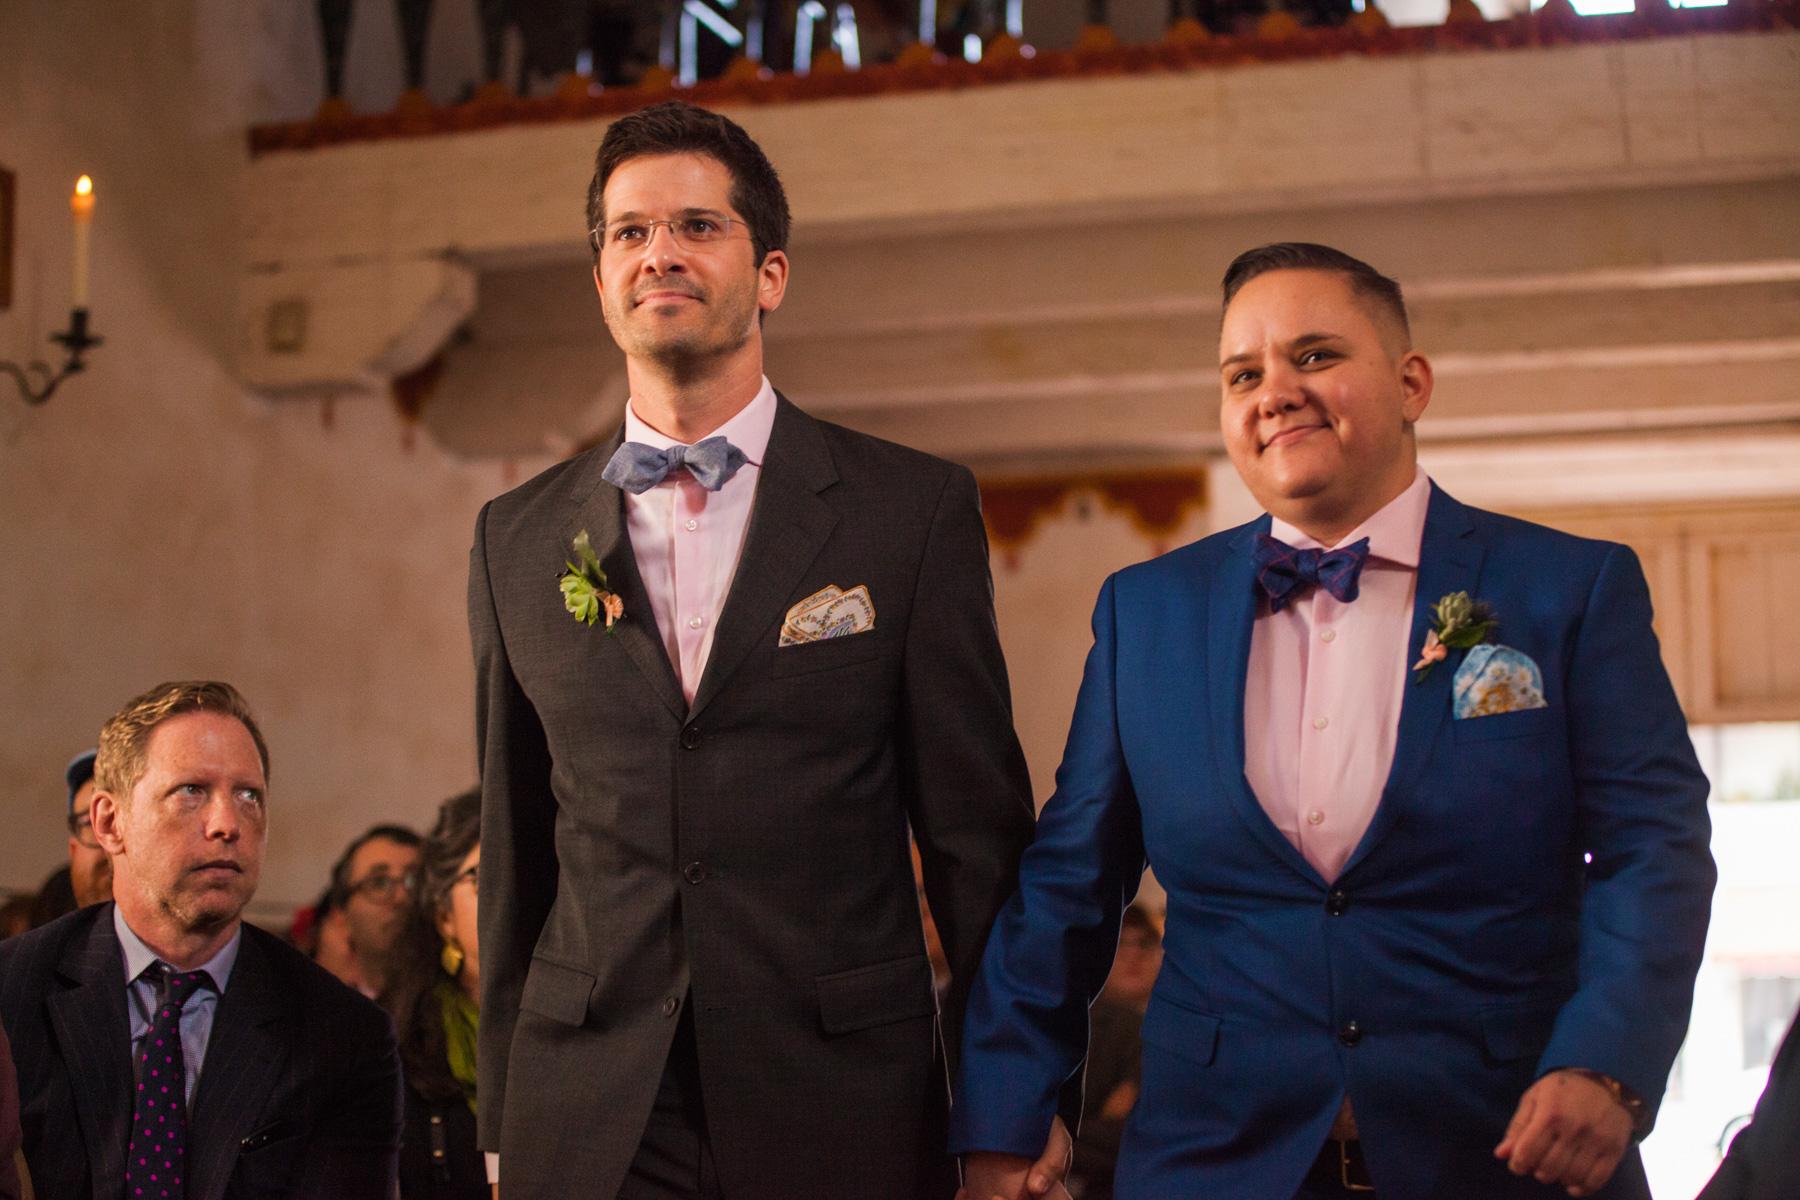 059-2018-santabarbara-wedding.jpg